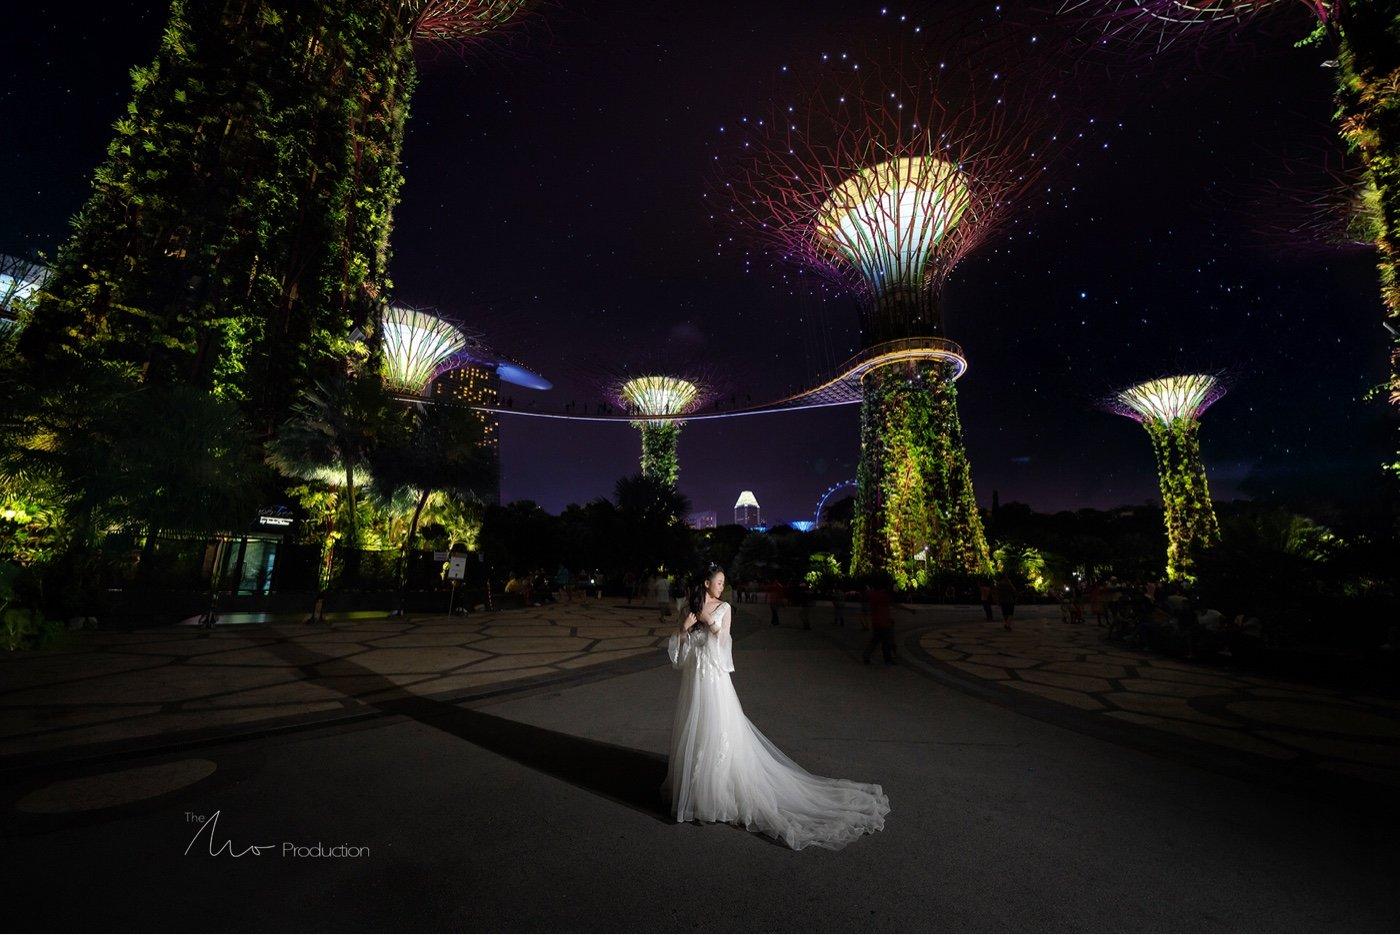 MoFoTo | 新加坡旅拍婚纱14